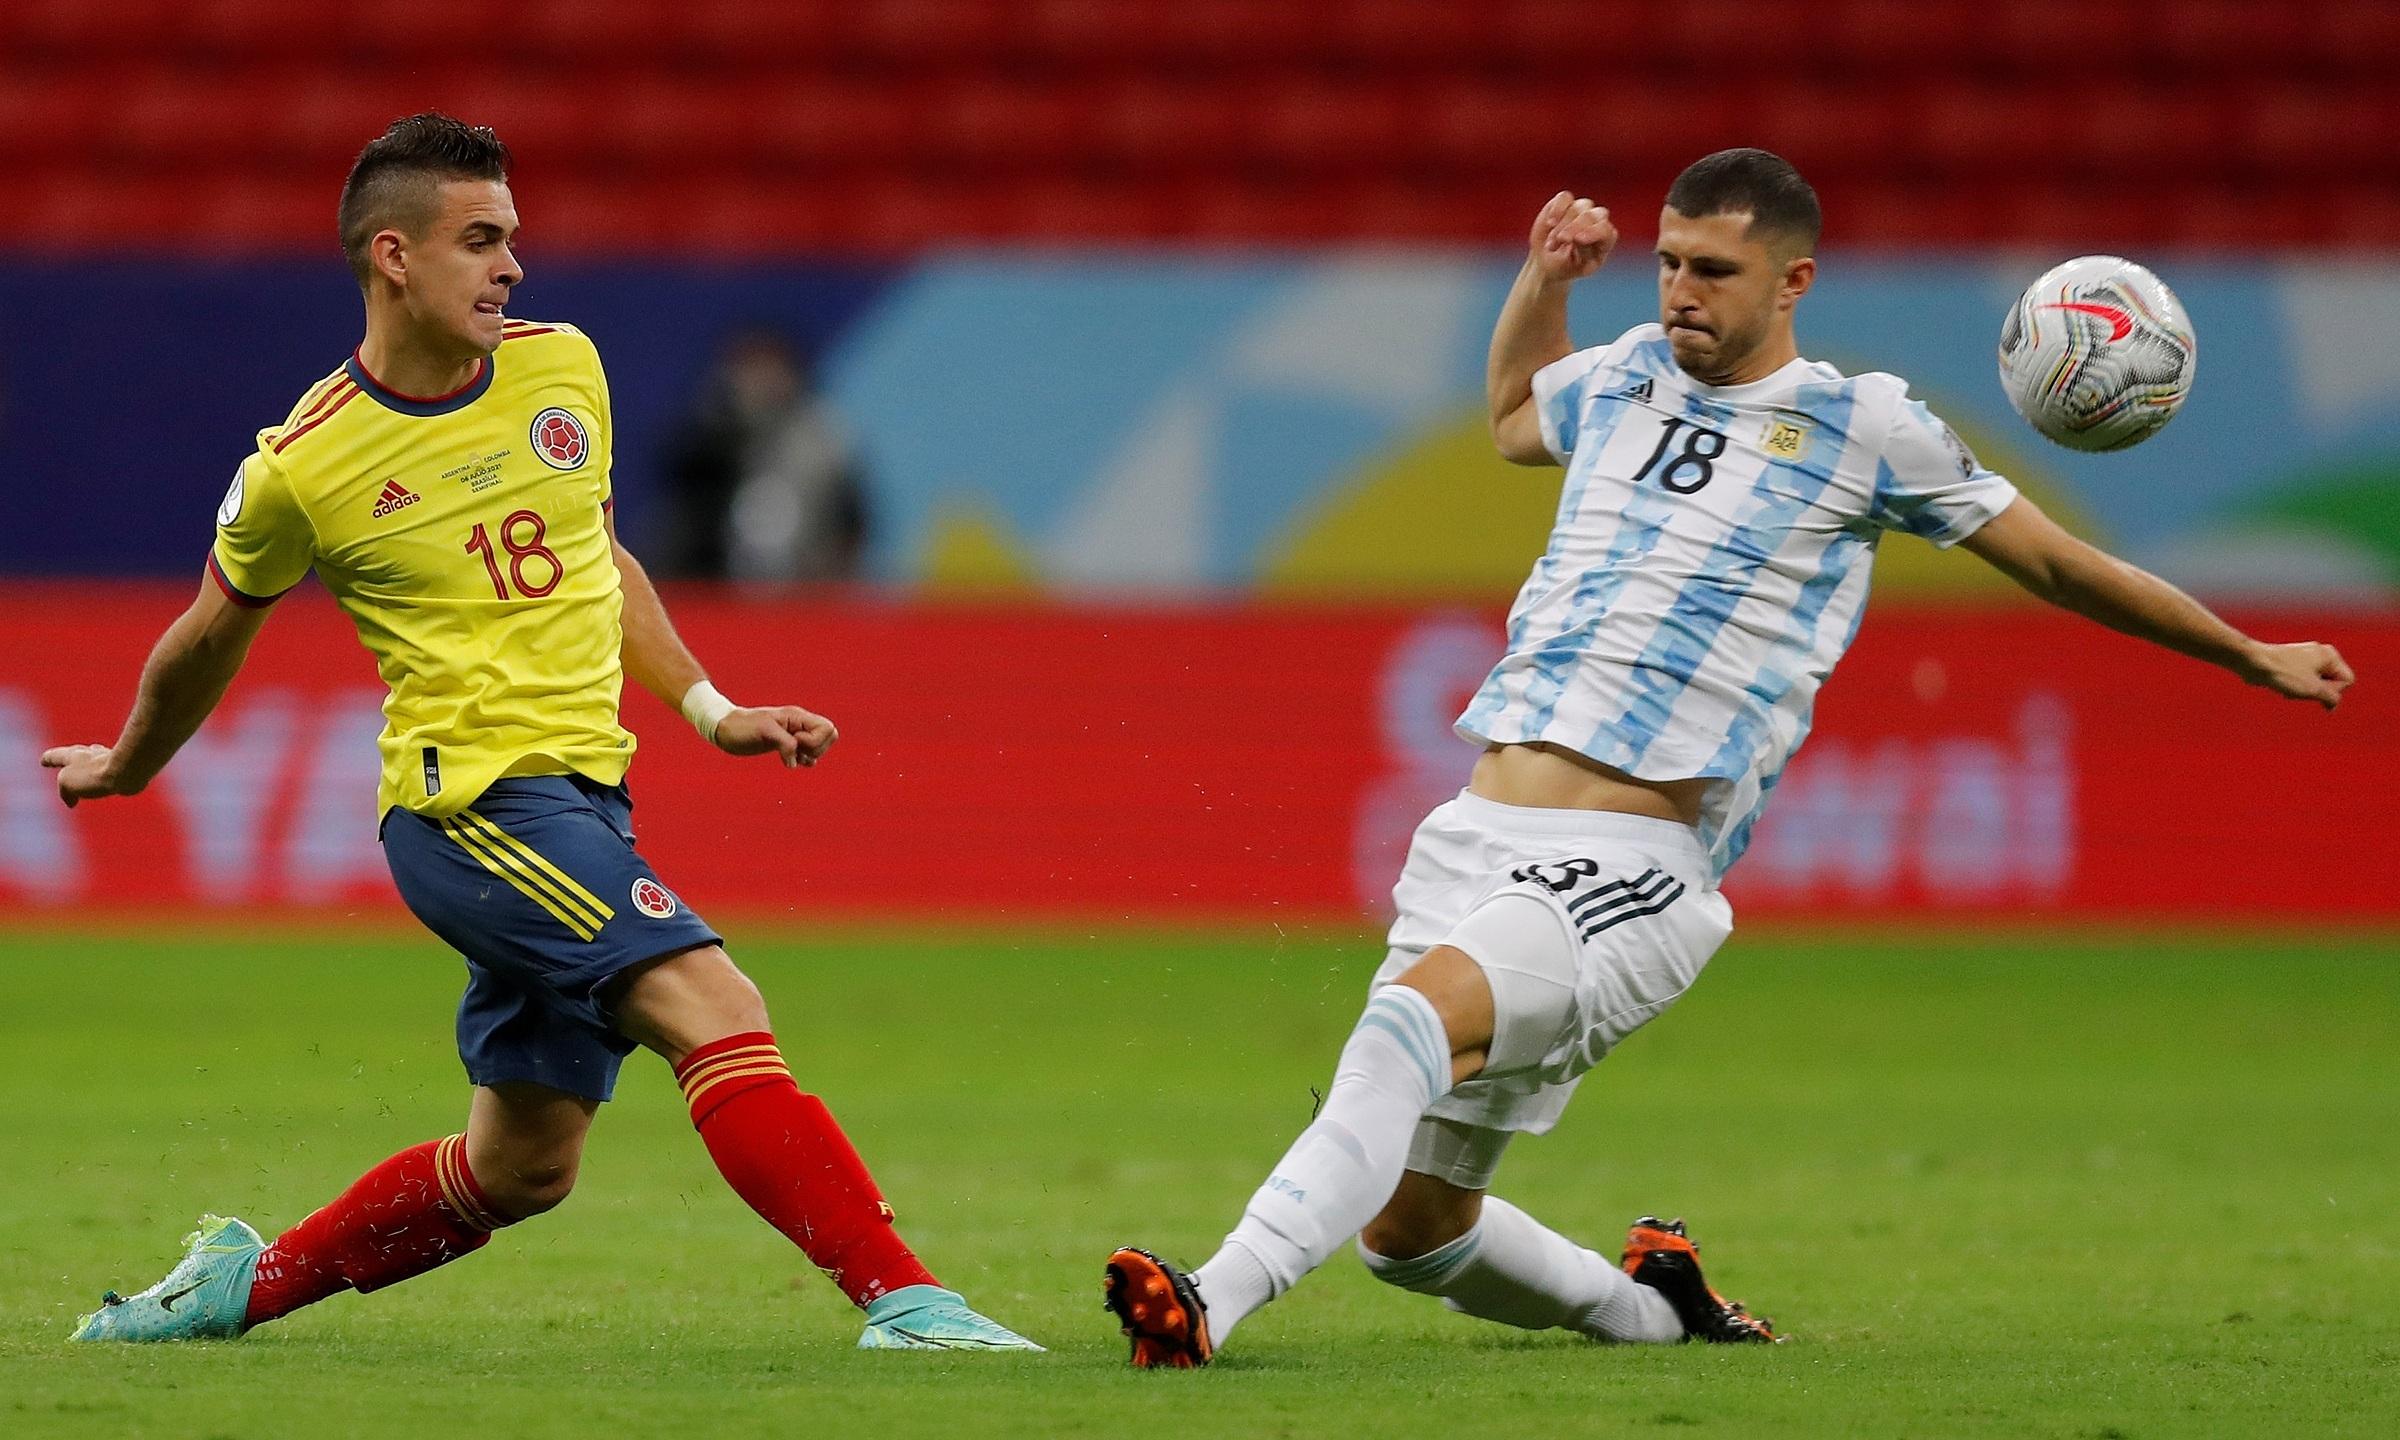 Kolombia 1-1 Argentina